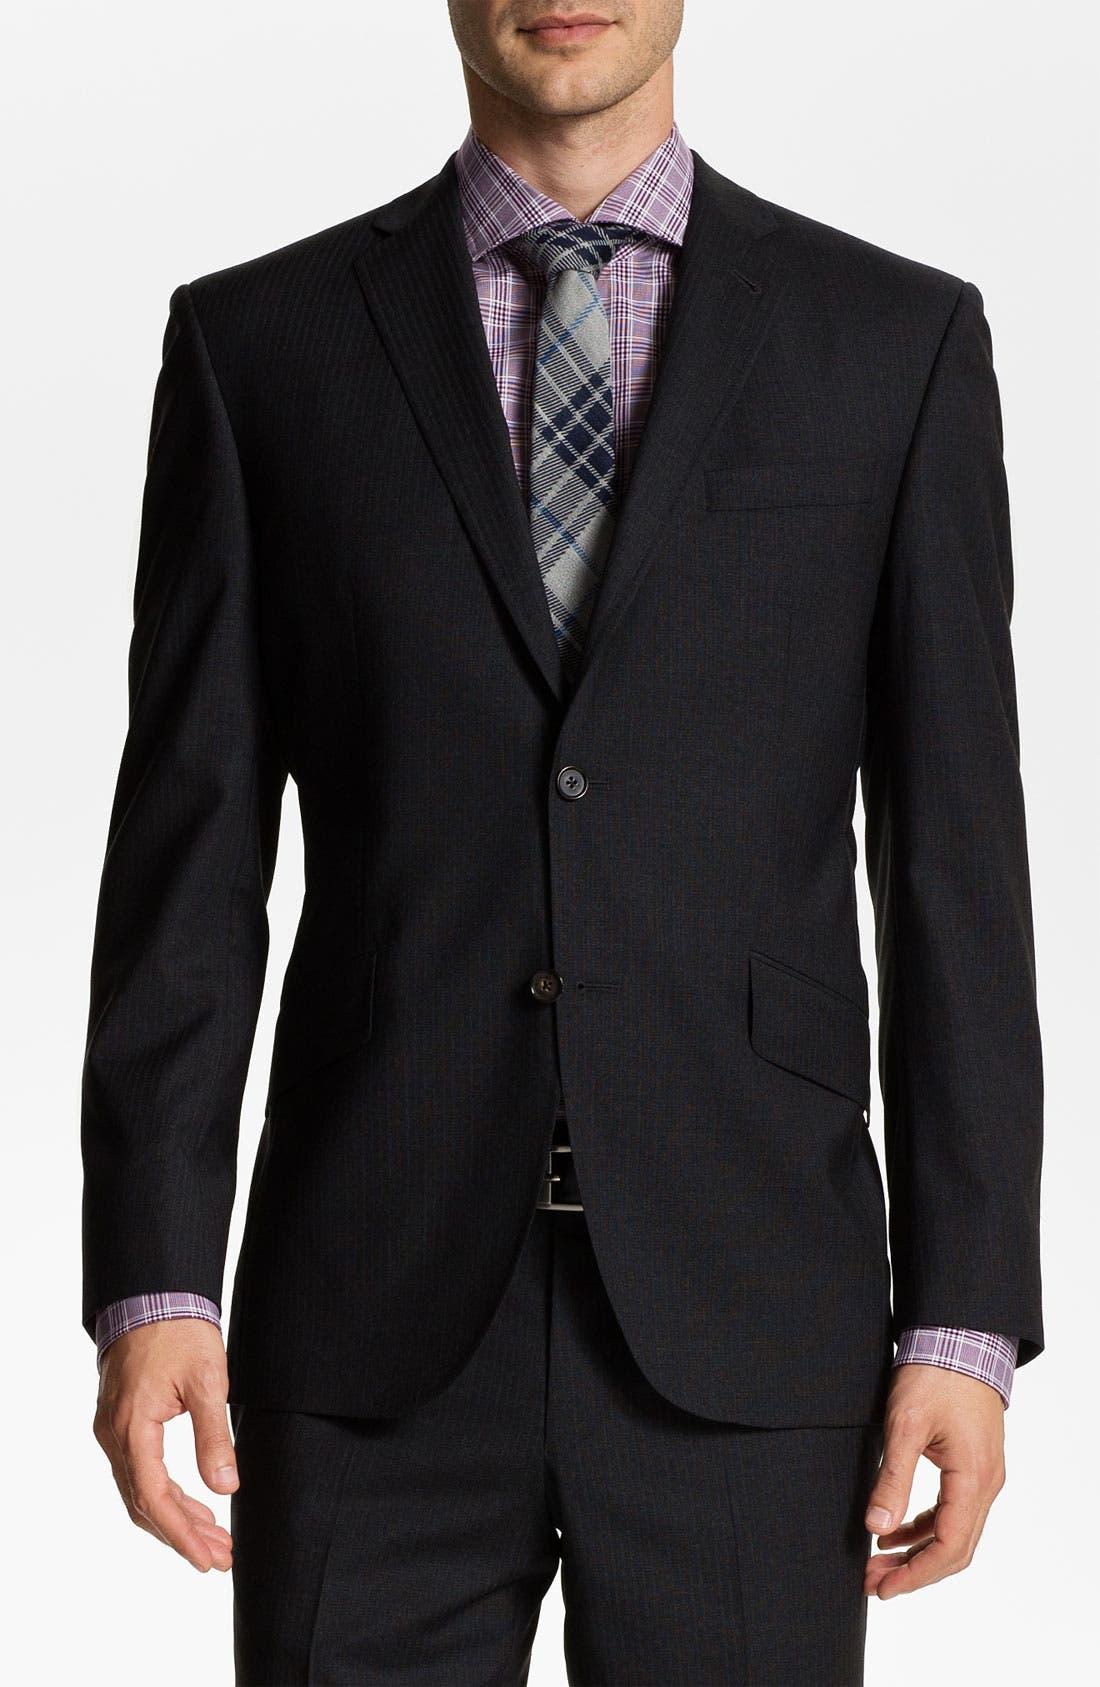 Alternate Image 1 Selected - Ted Baker London 'Jones' Trim Fit Wool Suit